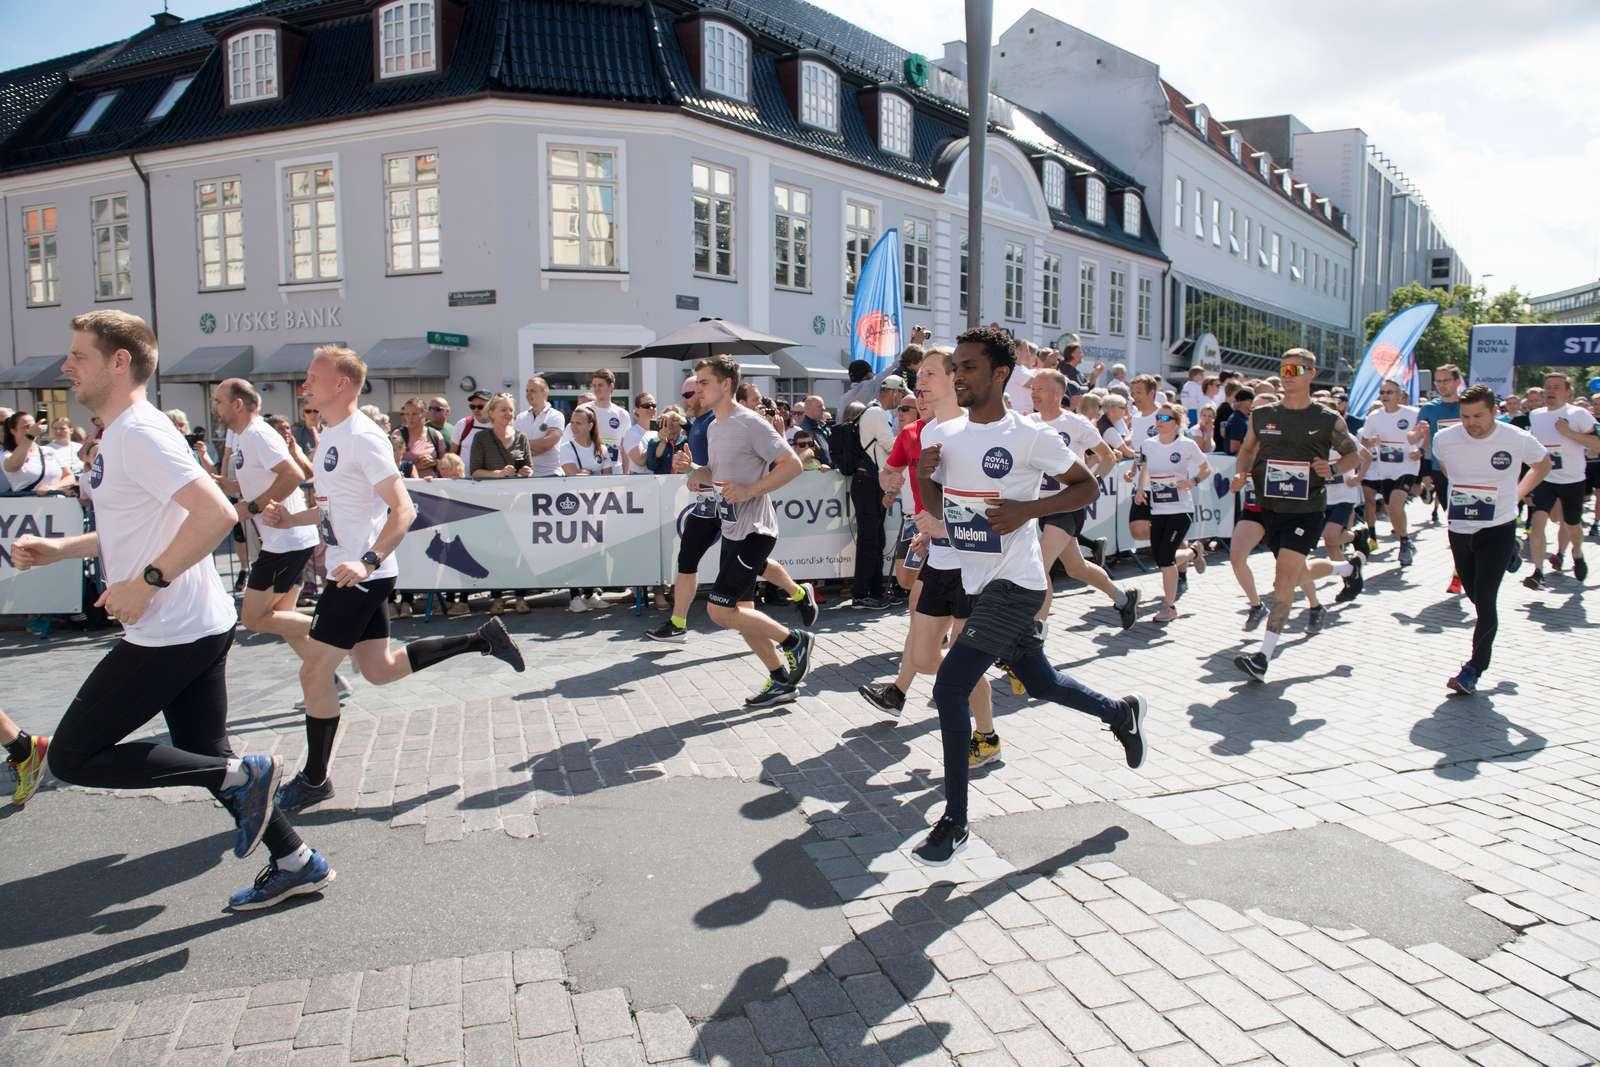 Aalborg_10km_1600px_COLOURBOX39576931.jpg